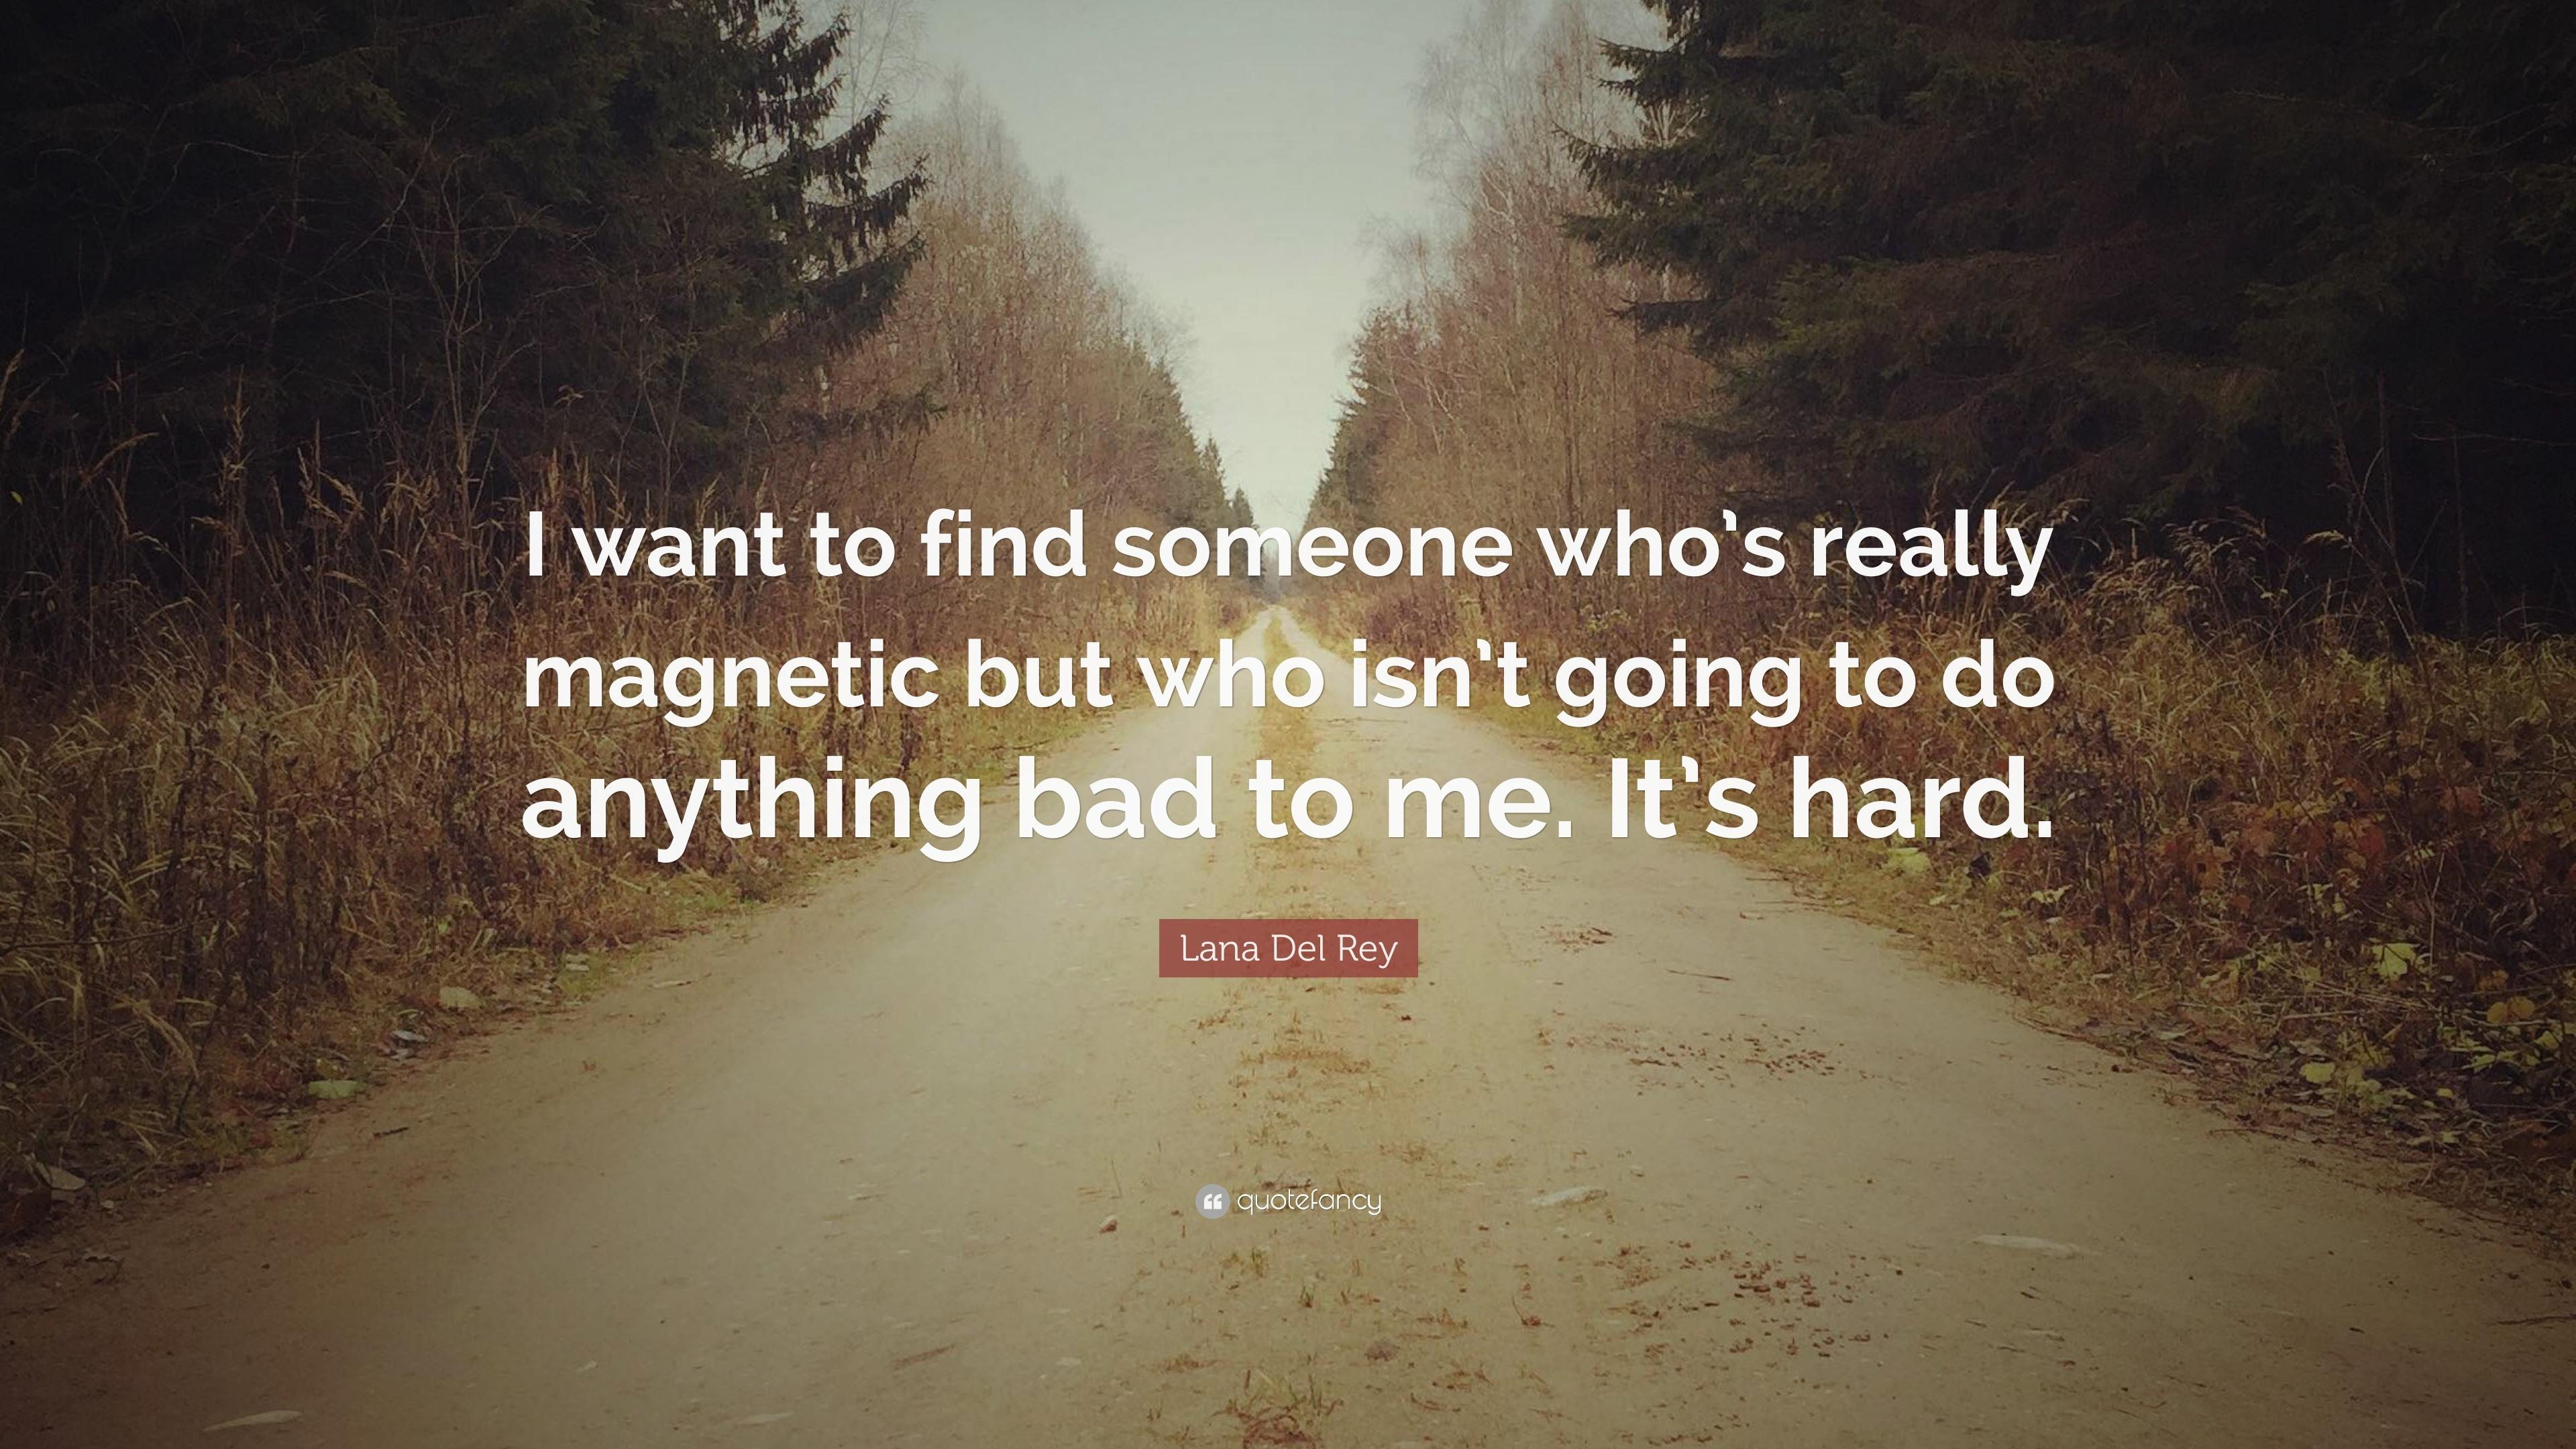 Find someone near me